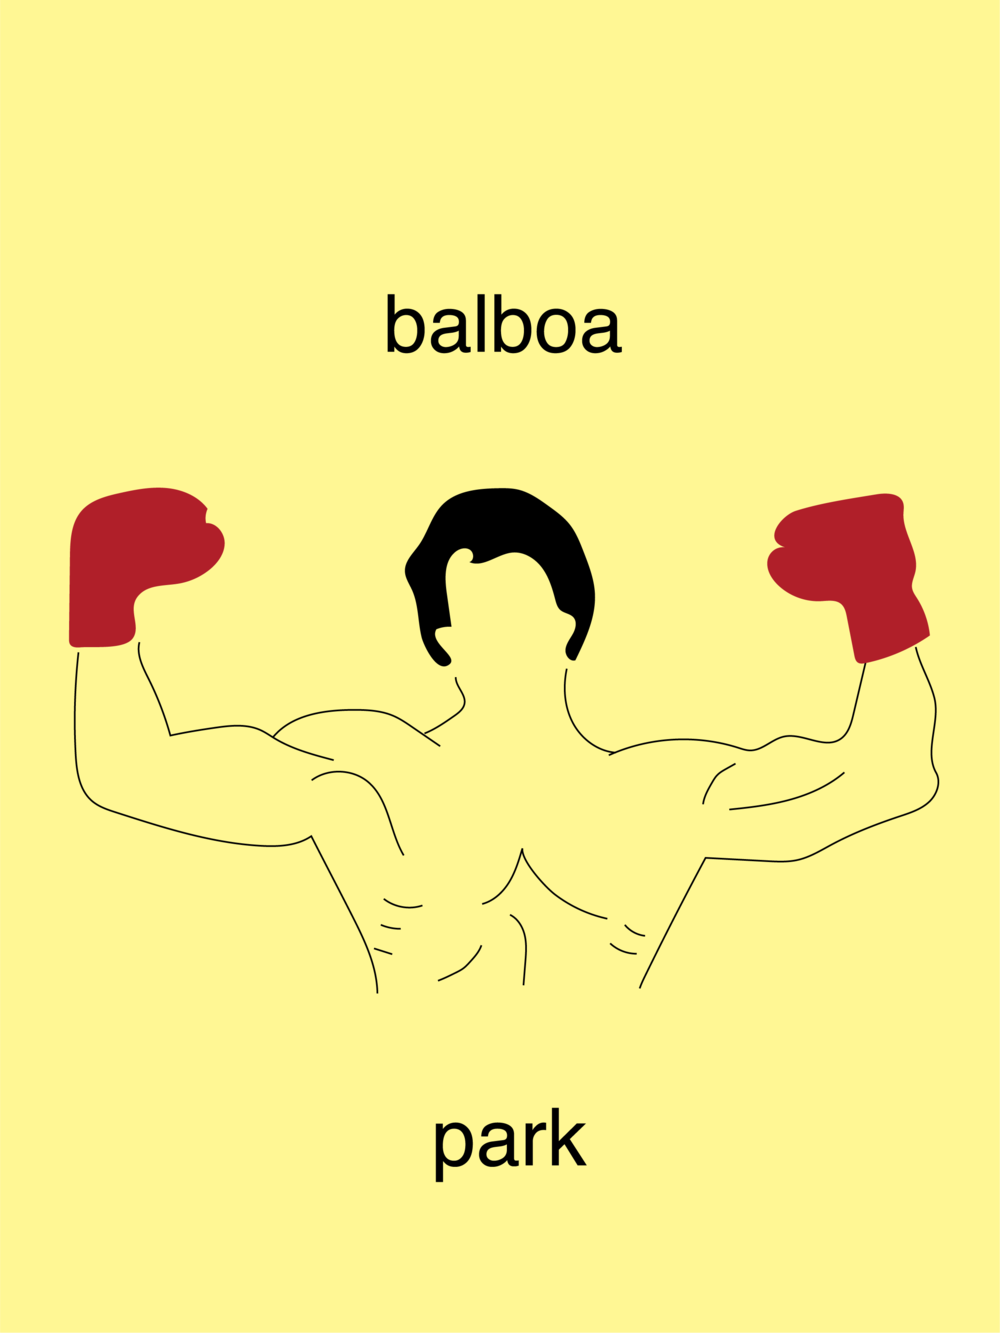 balboa_1@4x.png